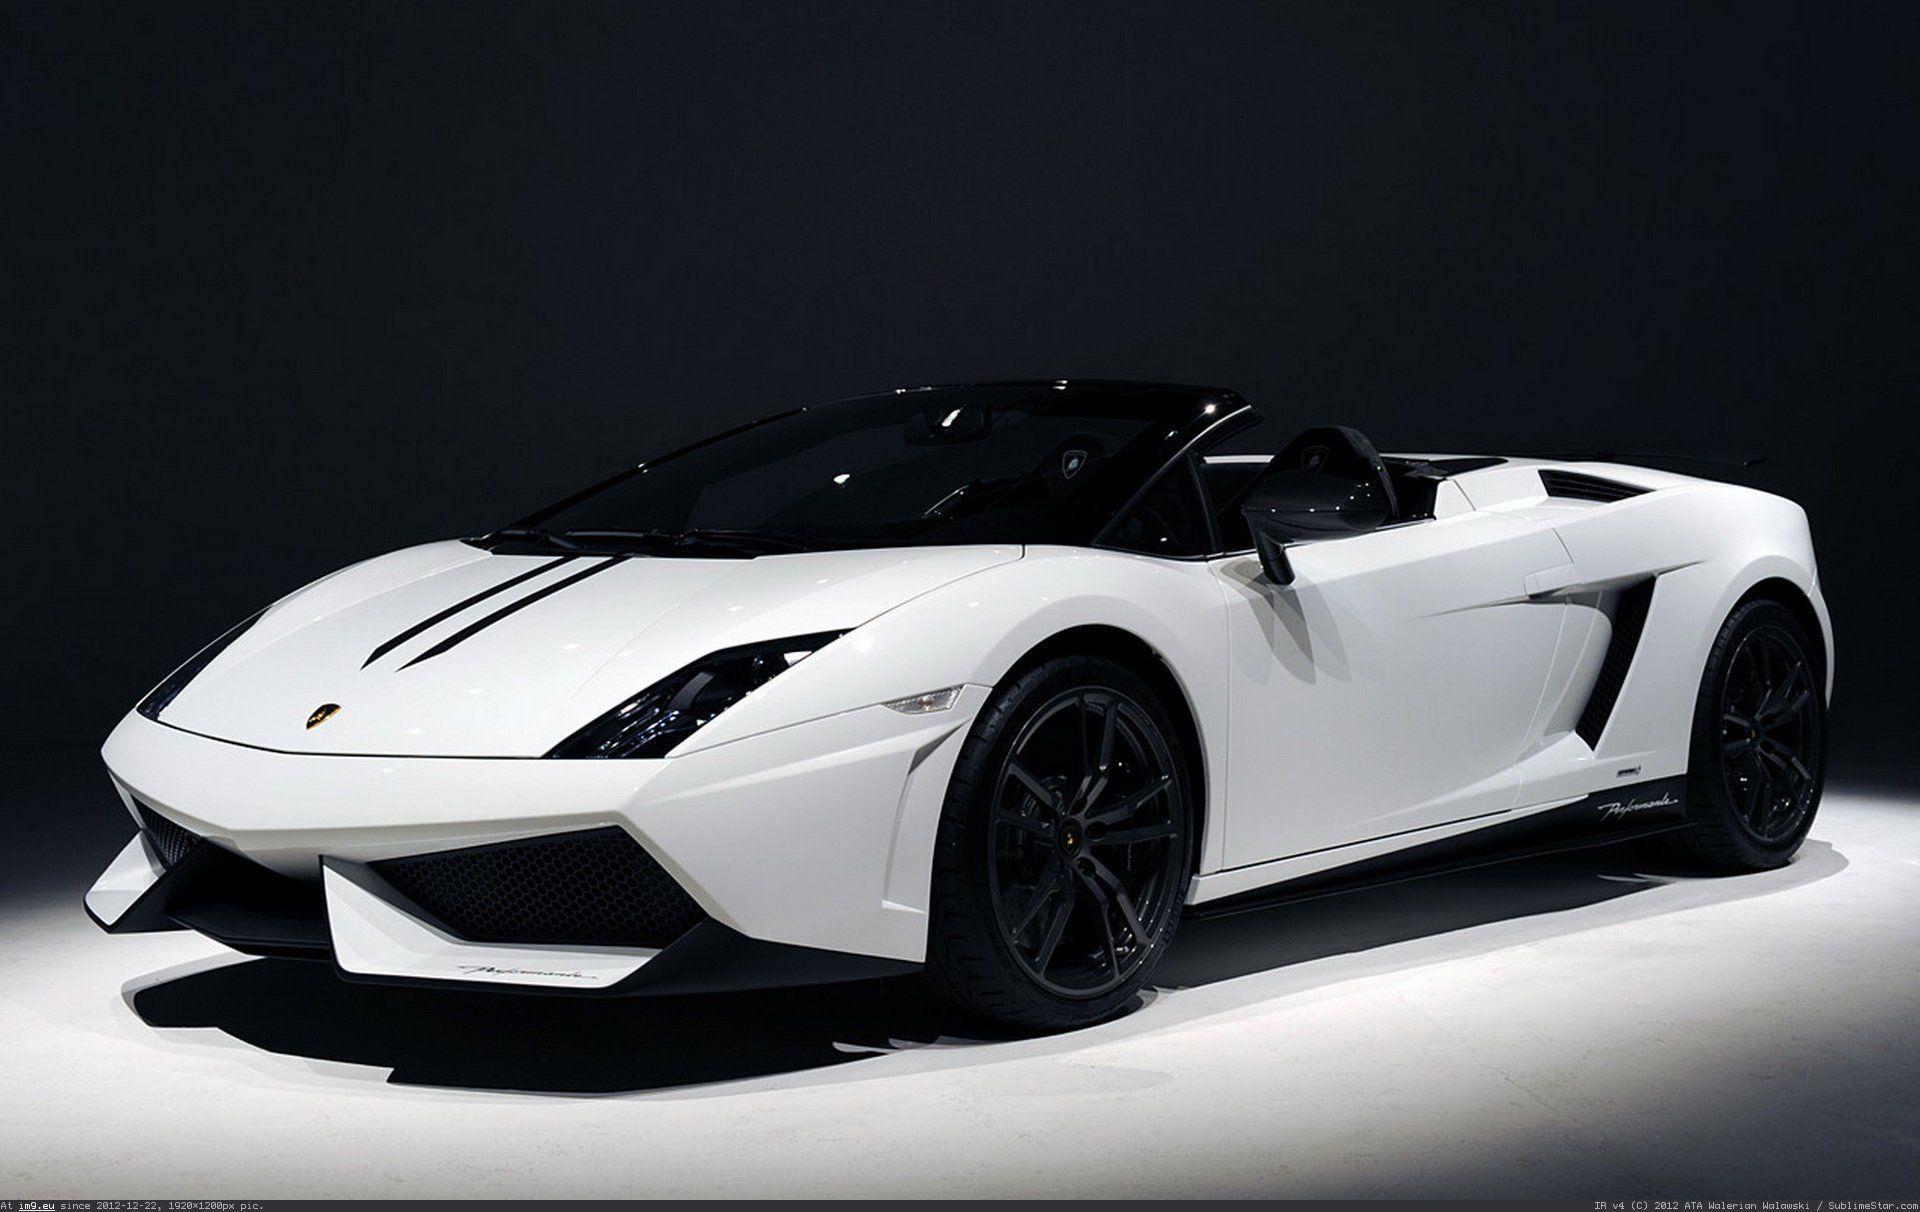 vehicles for lamborghini gallardo wallpaper hd lamborghini gallardo spyder - Lamborghini Gallardo Spyder Black 2013